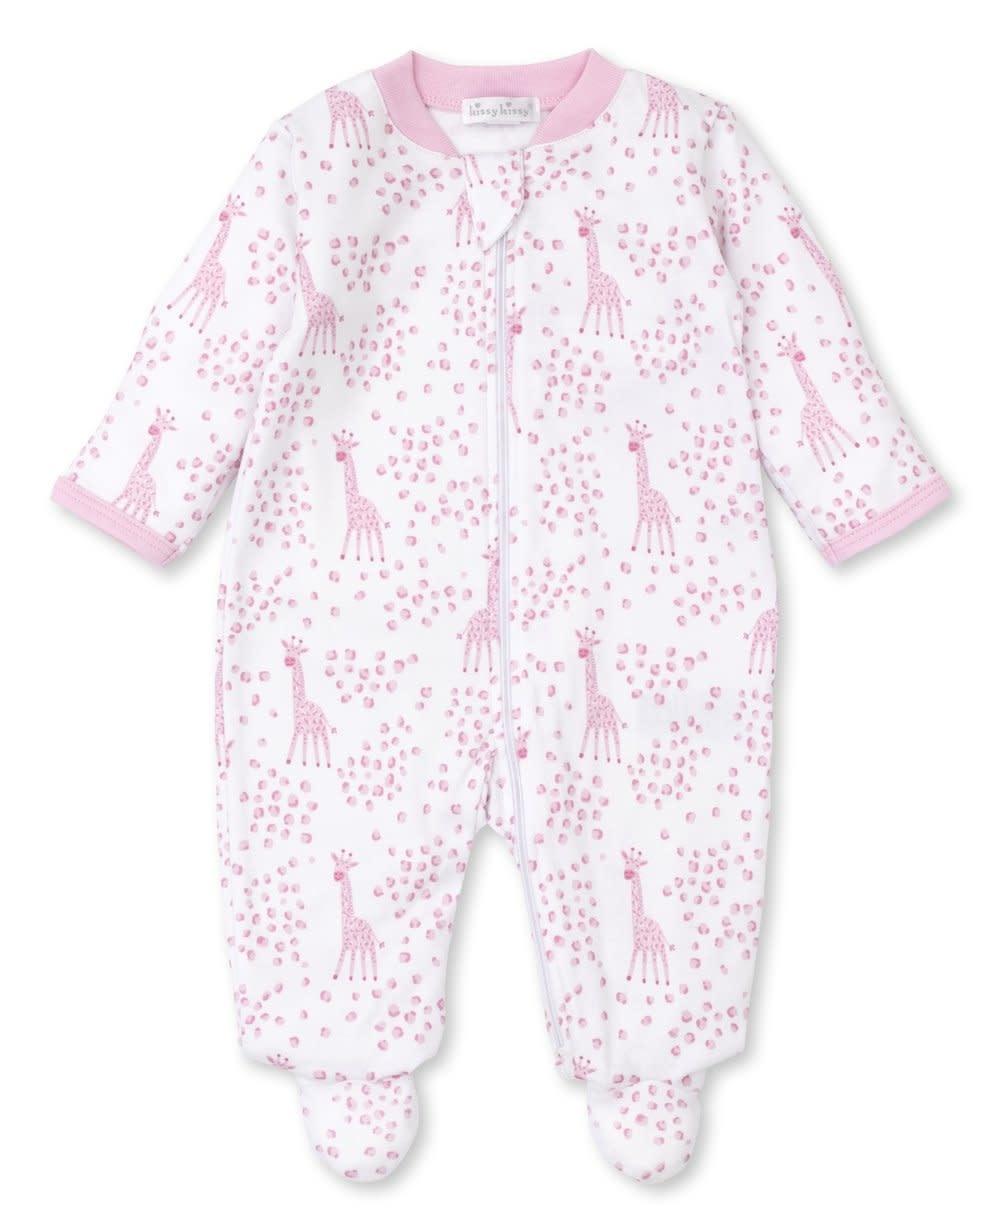 Kissy Kissy Pink Speckled Giraffes Zip Footie